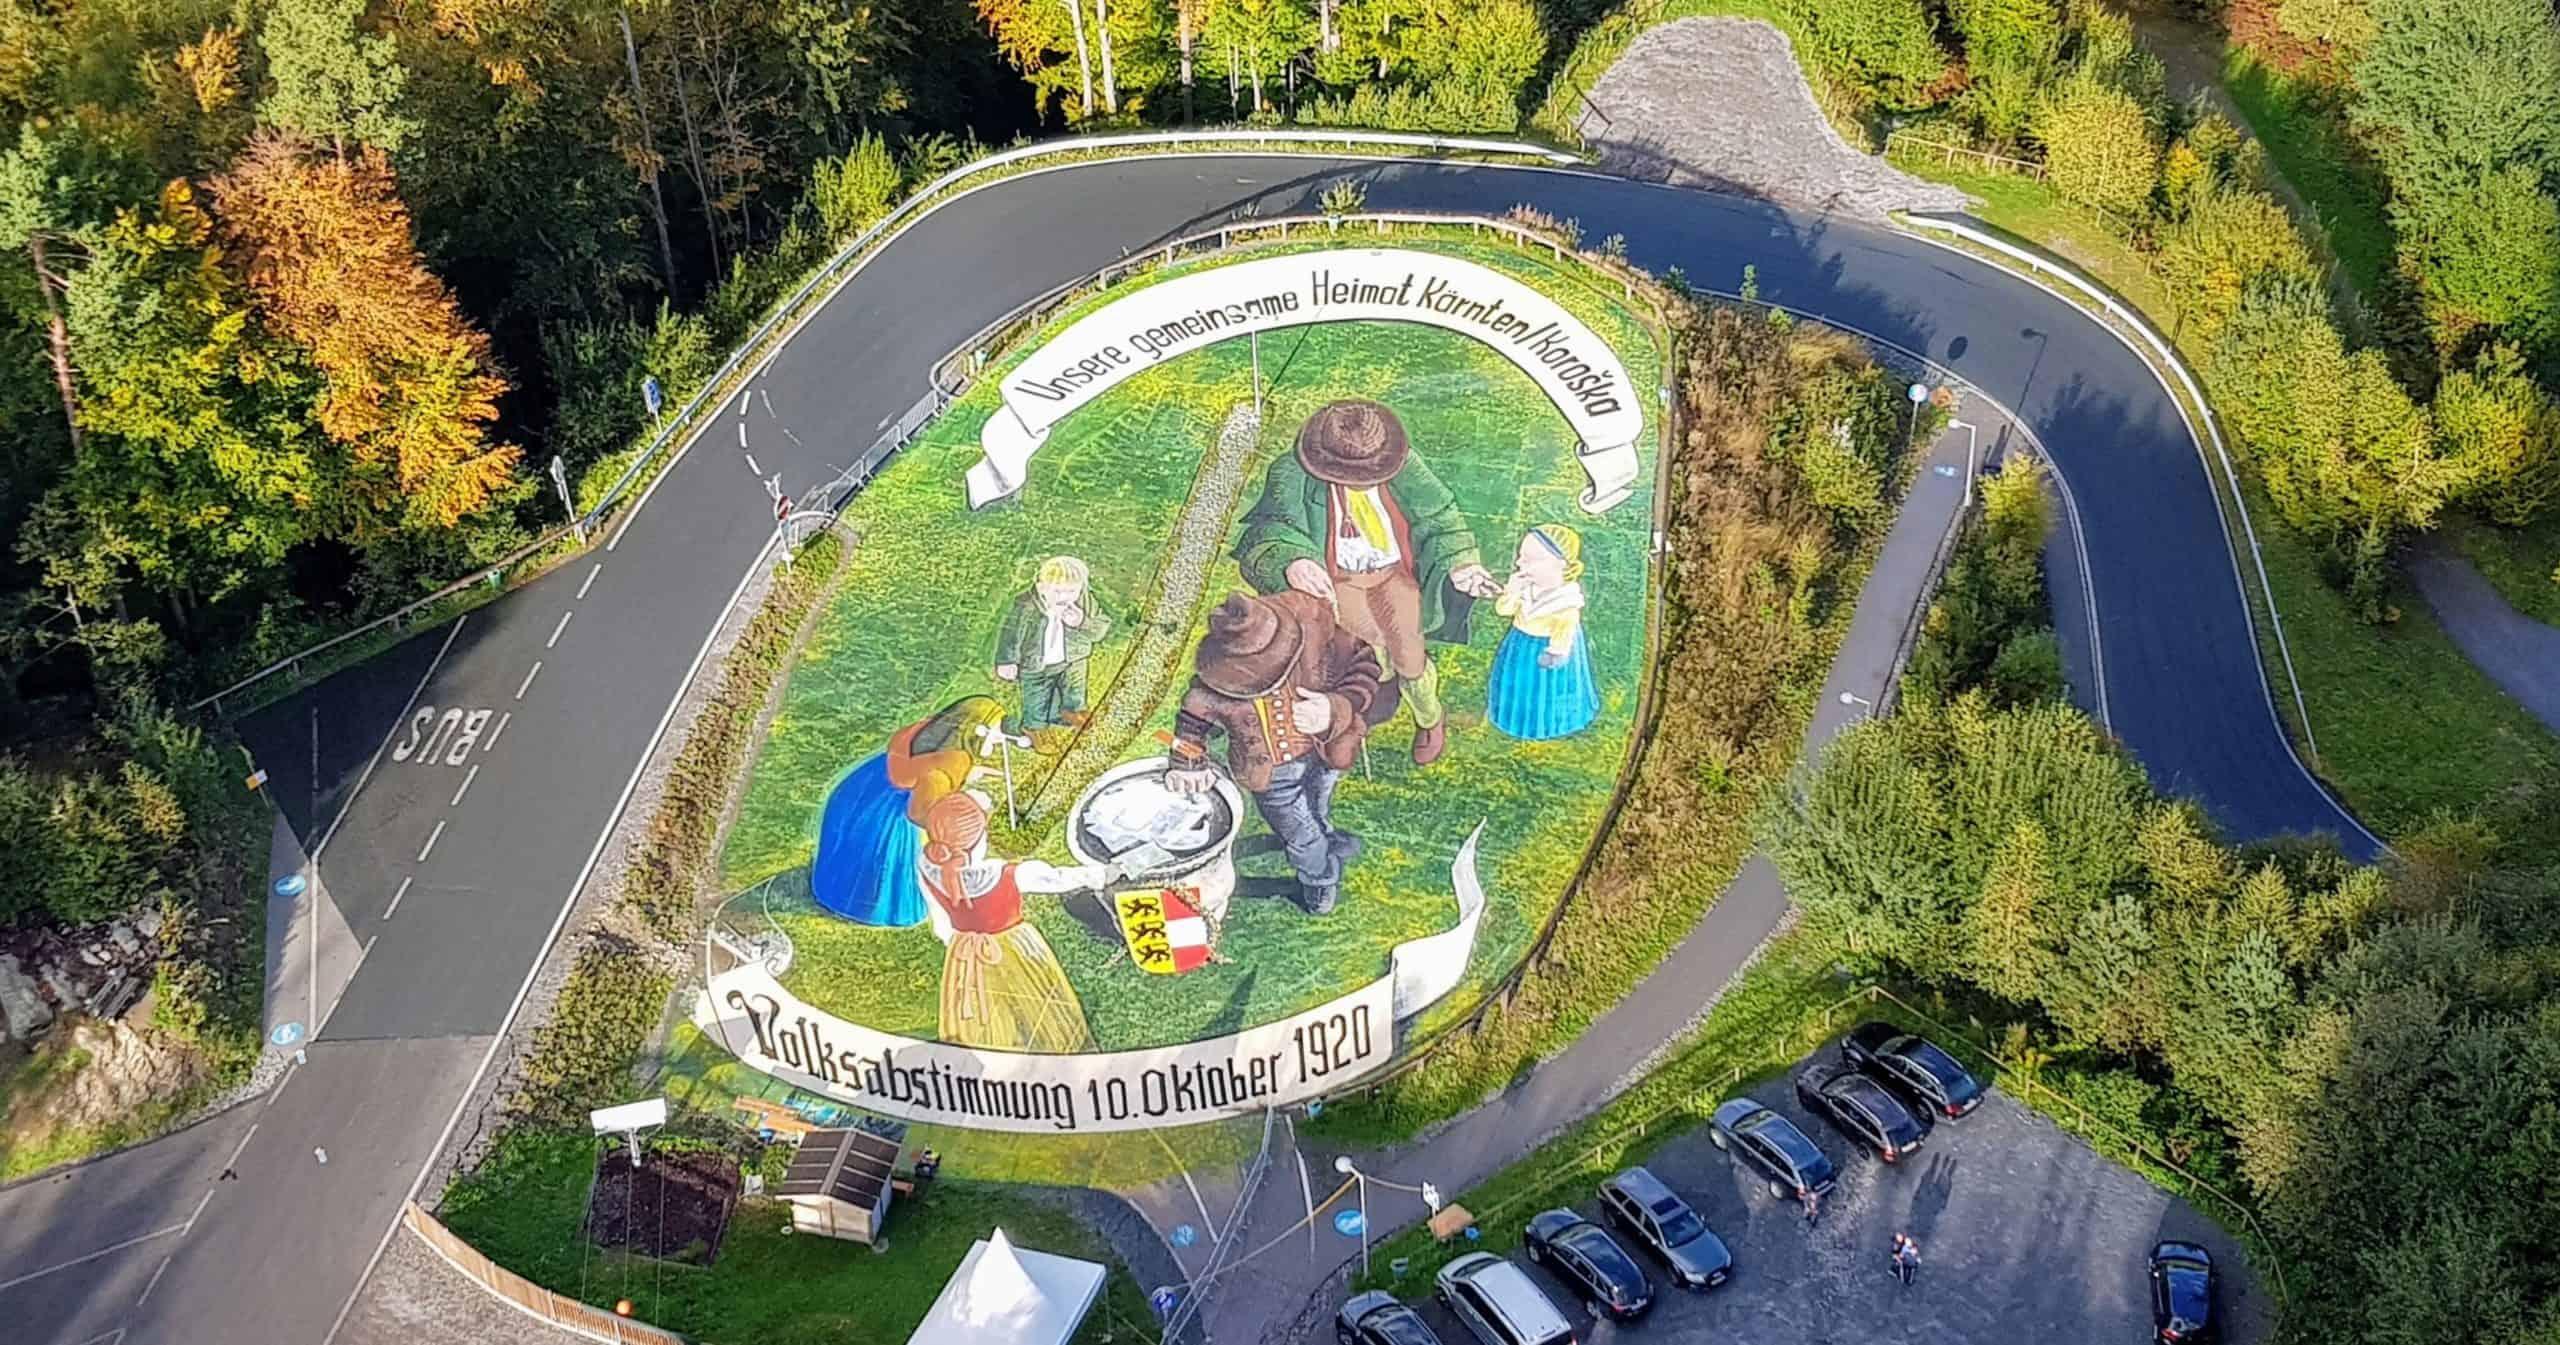 Voksabstimmung Kärnten Oktober Pyramidenkogel Kunstwerk 3D